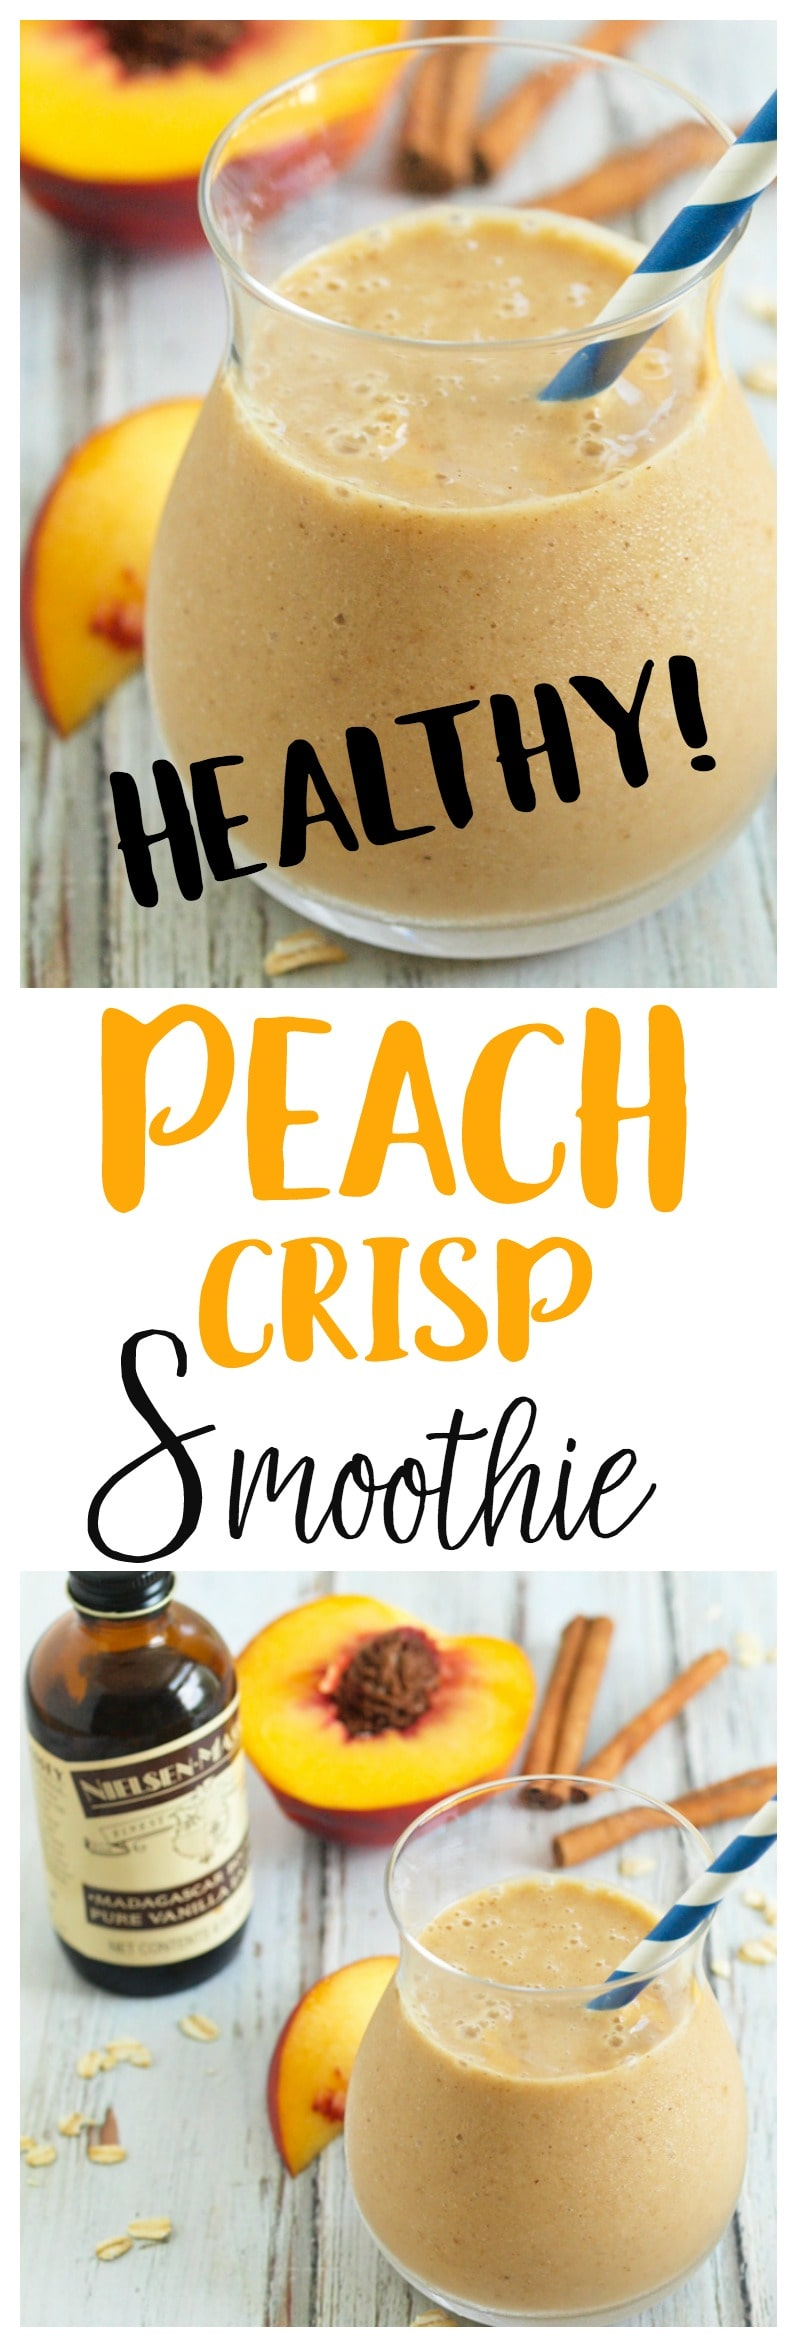 Peach Crisp Smoothie--a healthy smoothie recipe that tastes like dessert! Vegan and gluten-free